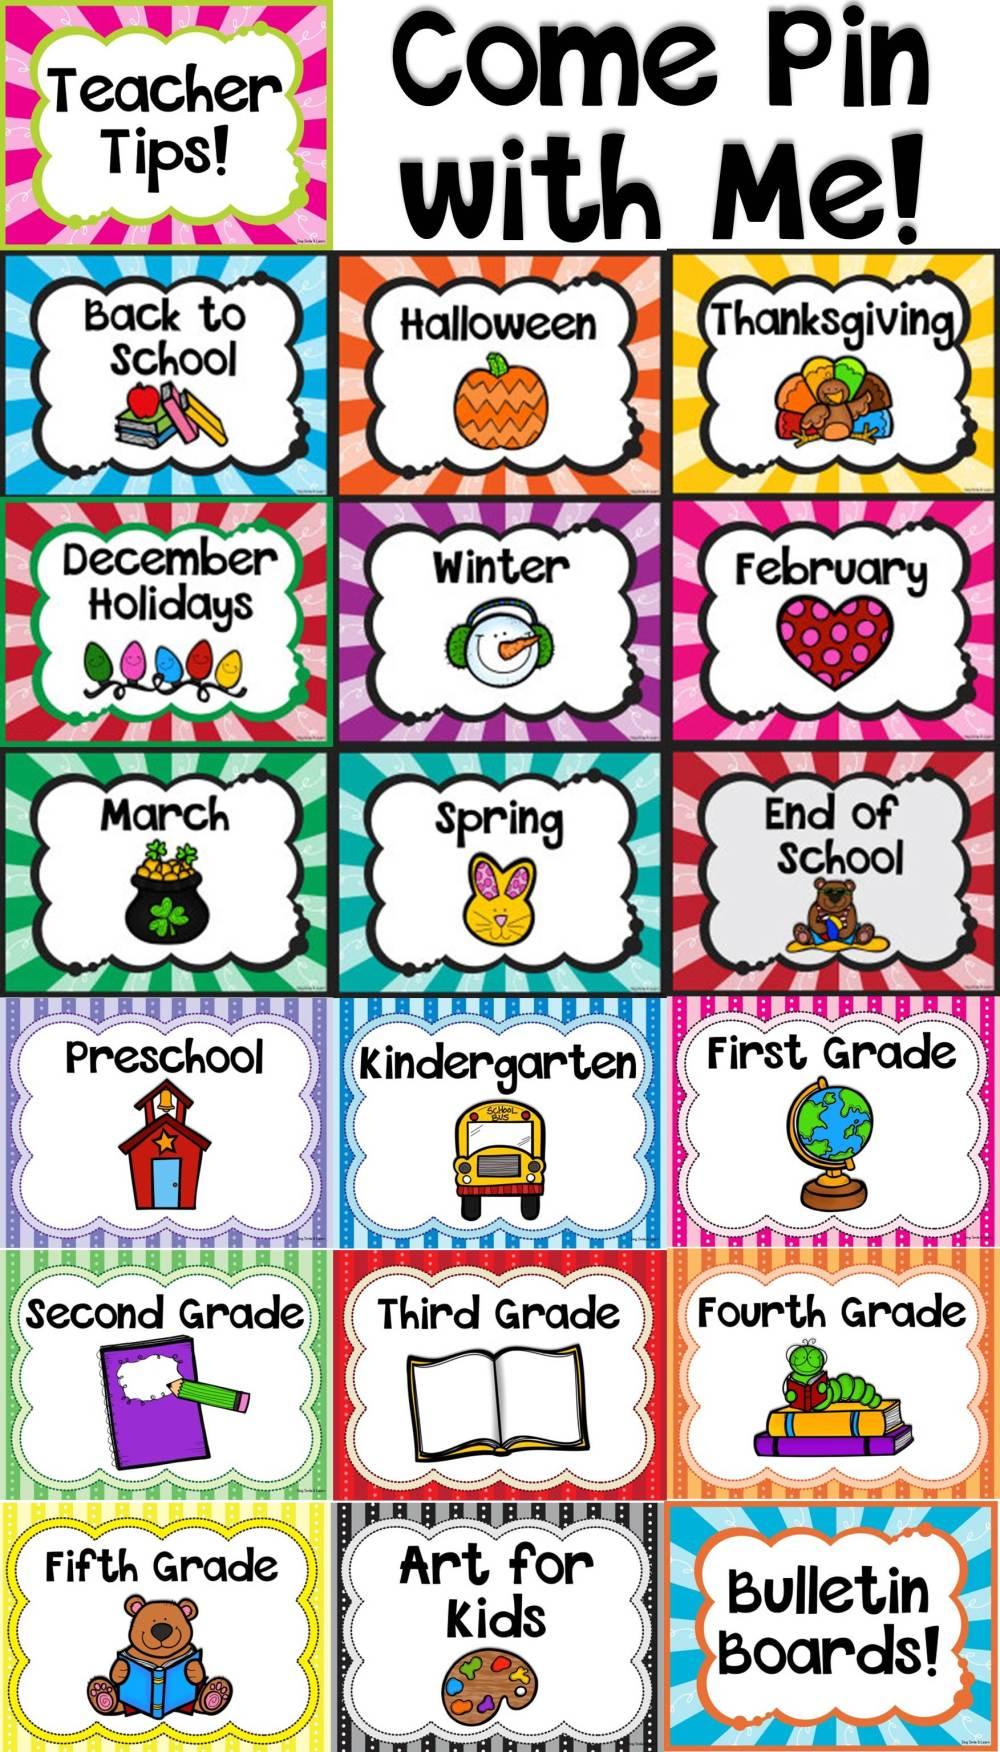 medium resolution of Back to School Advice \u0026 Tips for New Teachers - Happy Teacher